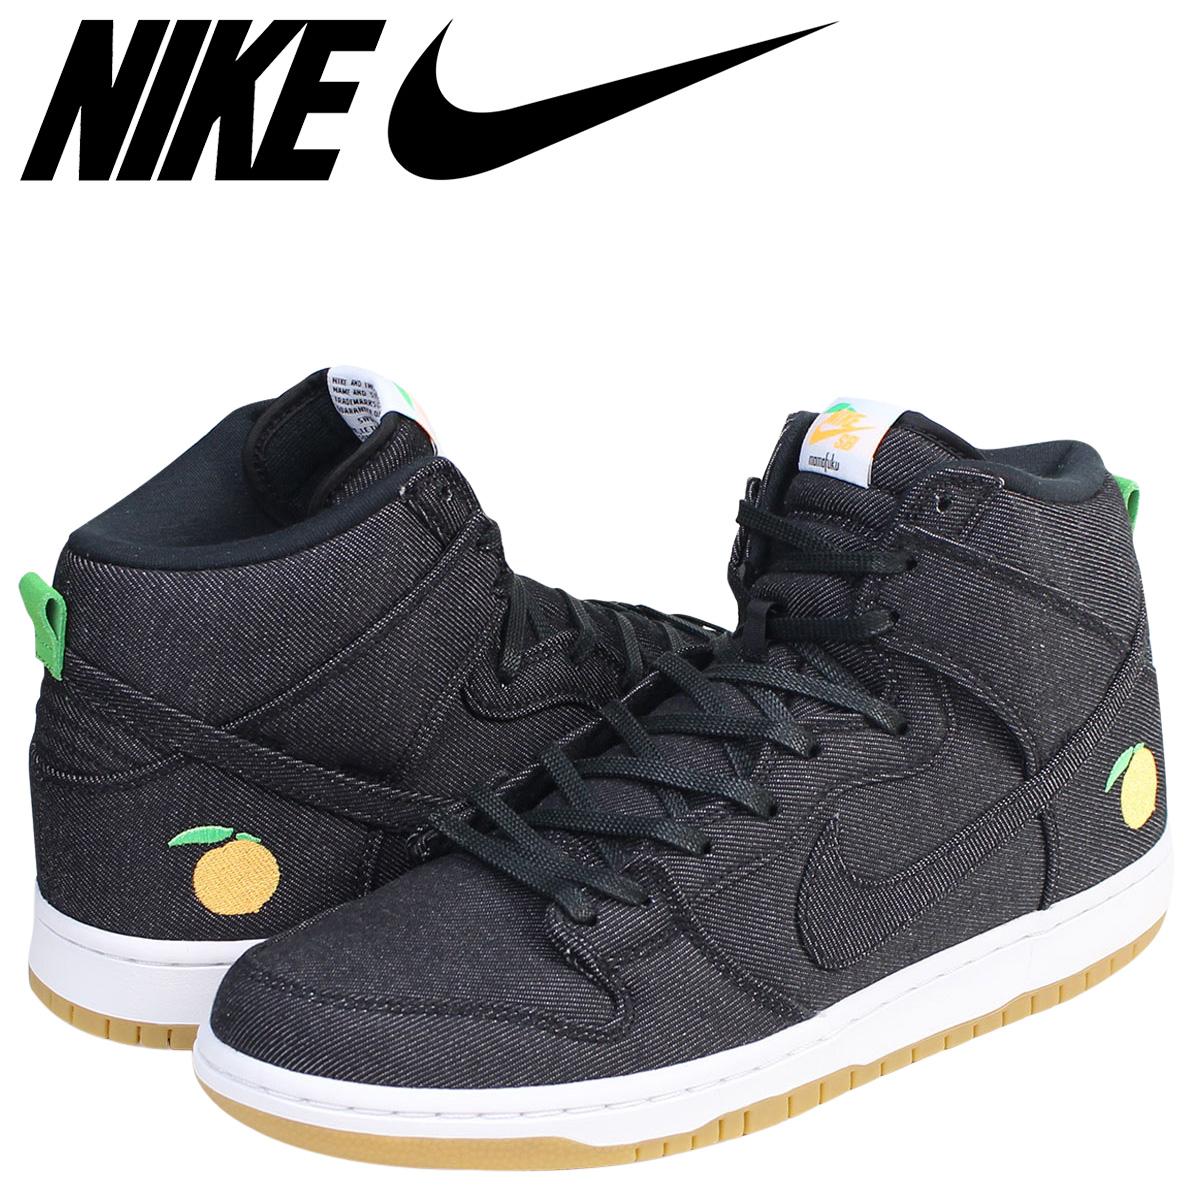 cheap for discount 5d541 ef05f NIKE Nike SB dunk high sneakers DUNK HIGH TRD QS MOMOFUKU 881,758-071 men's  shoes black